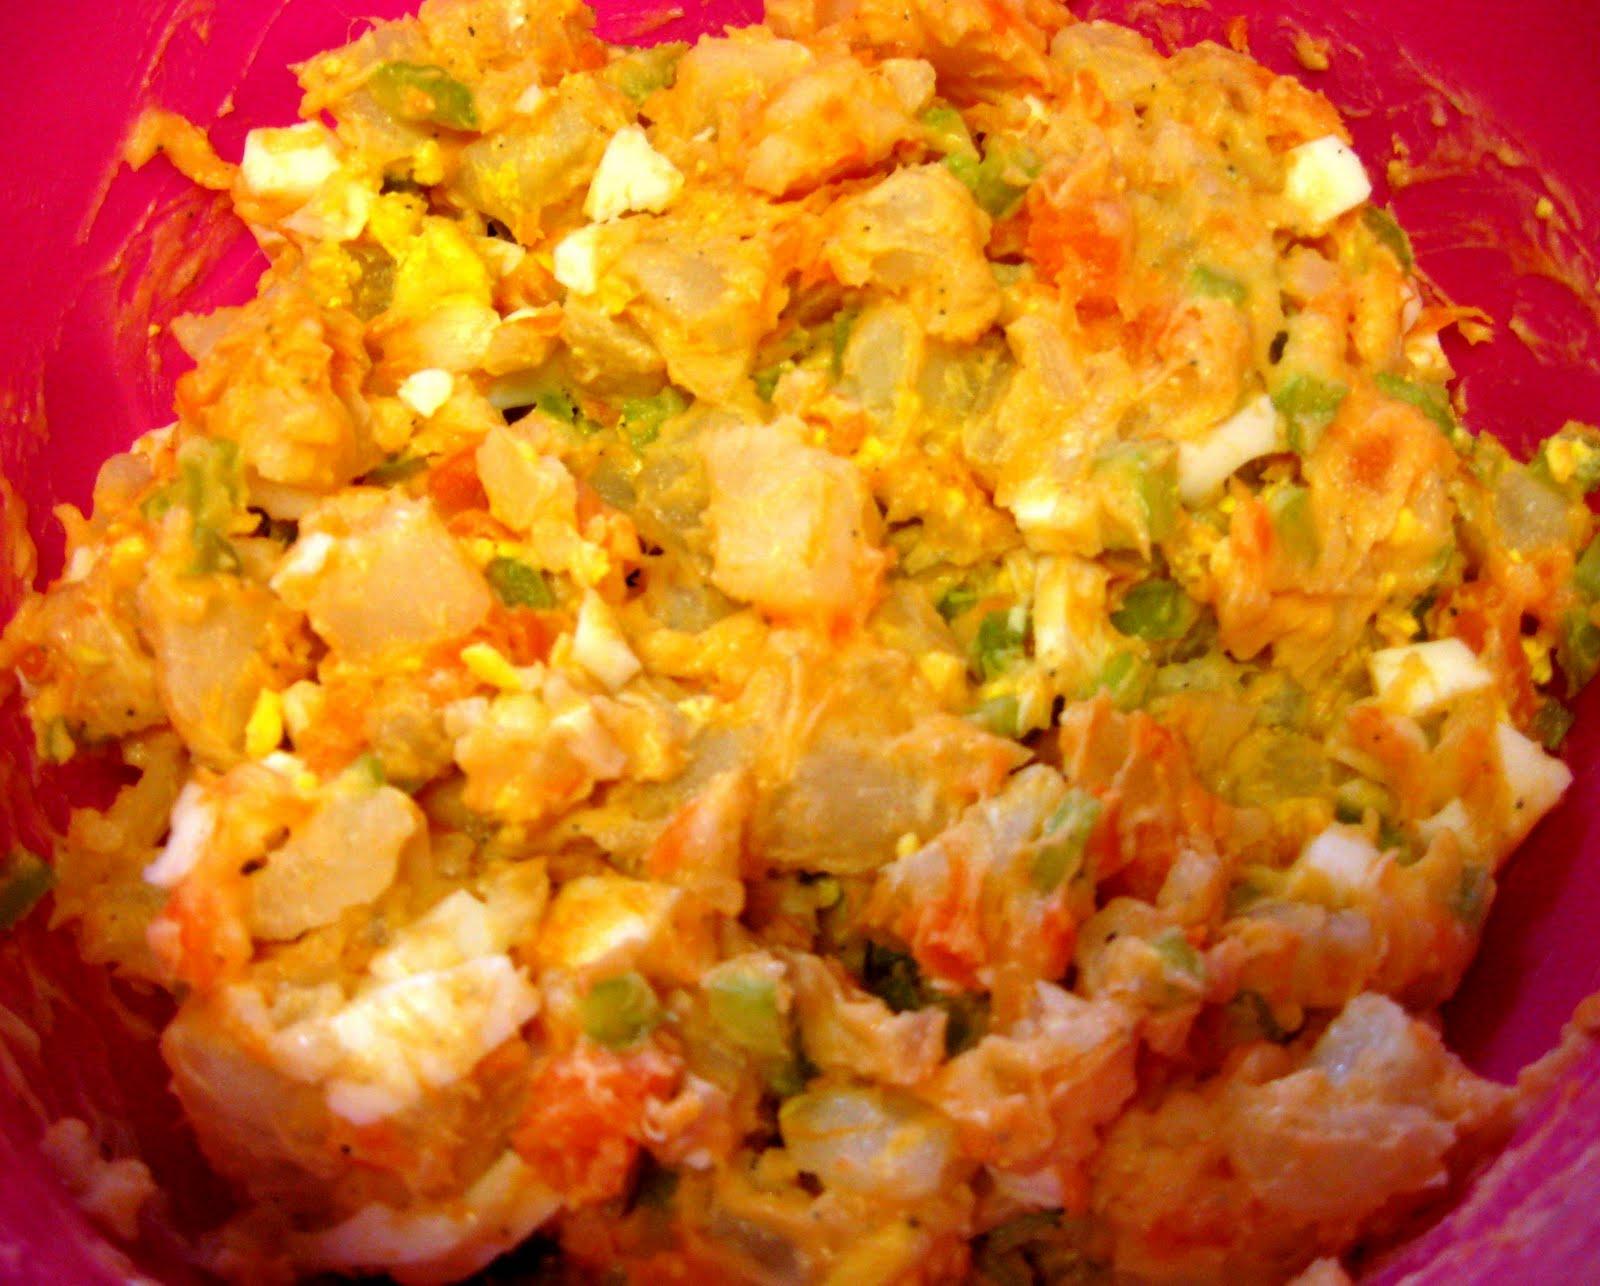 Debbi Does Dinner... Healthy & Low Calorie: Sweet Potato, Potato Salad